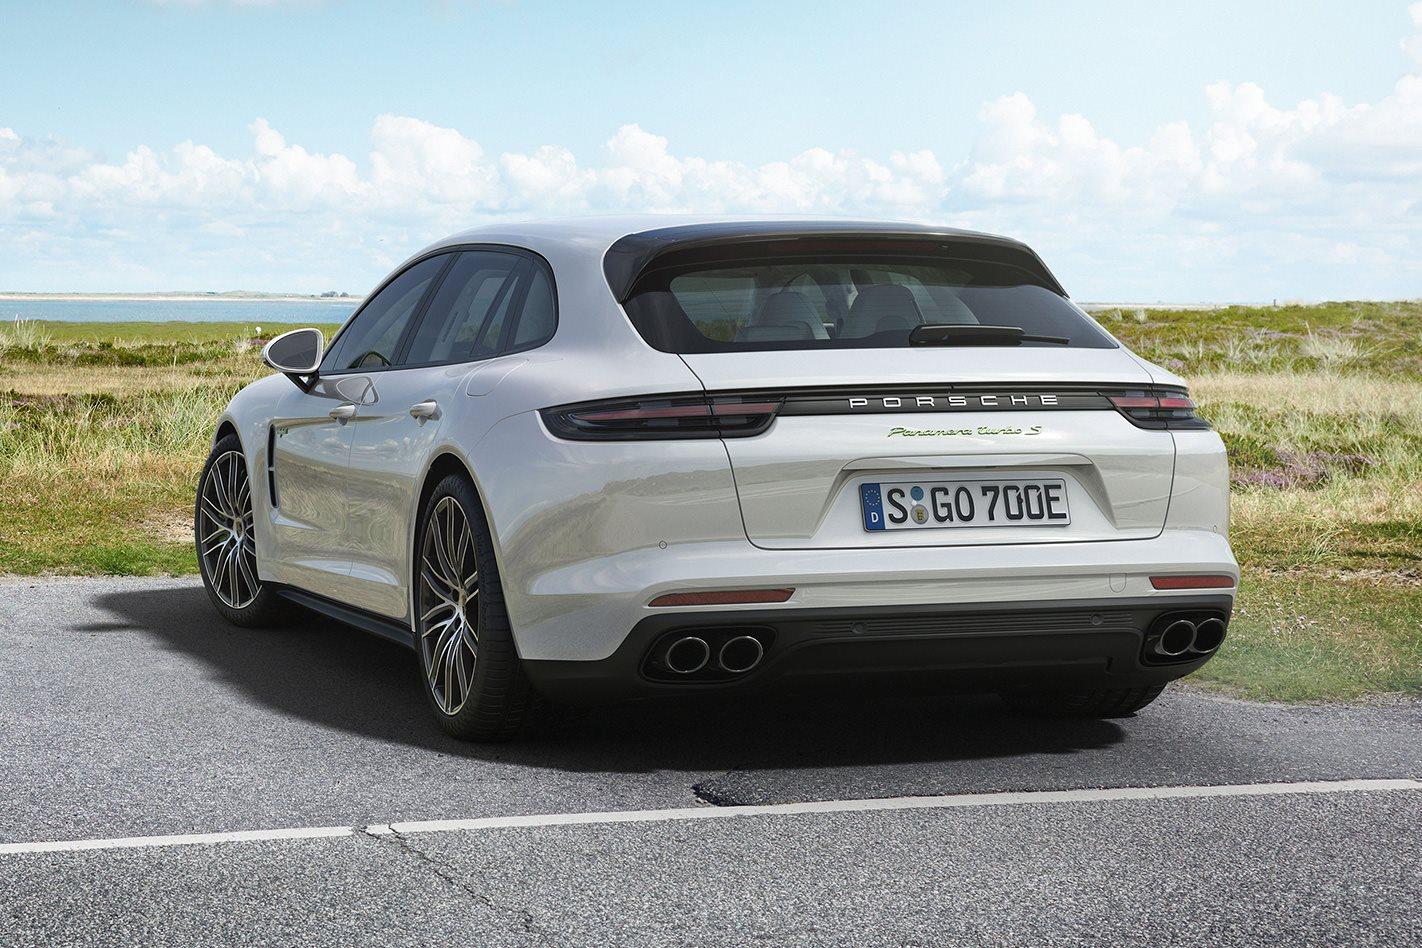 Porsche Turbo S E-Hybrid Sport wagon rear